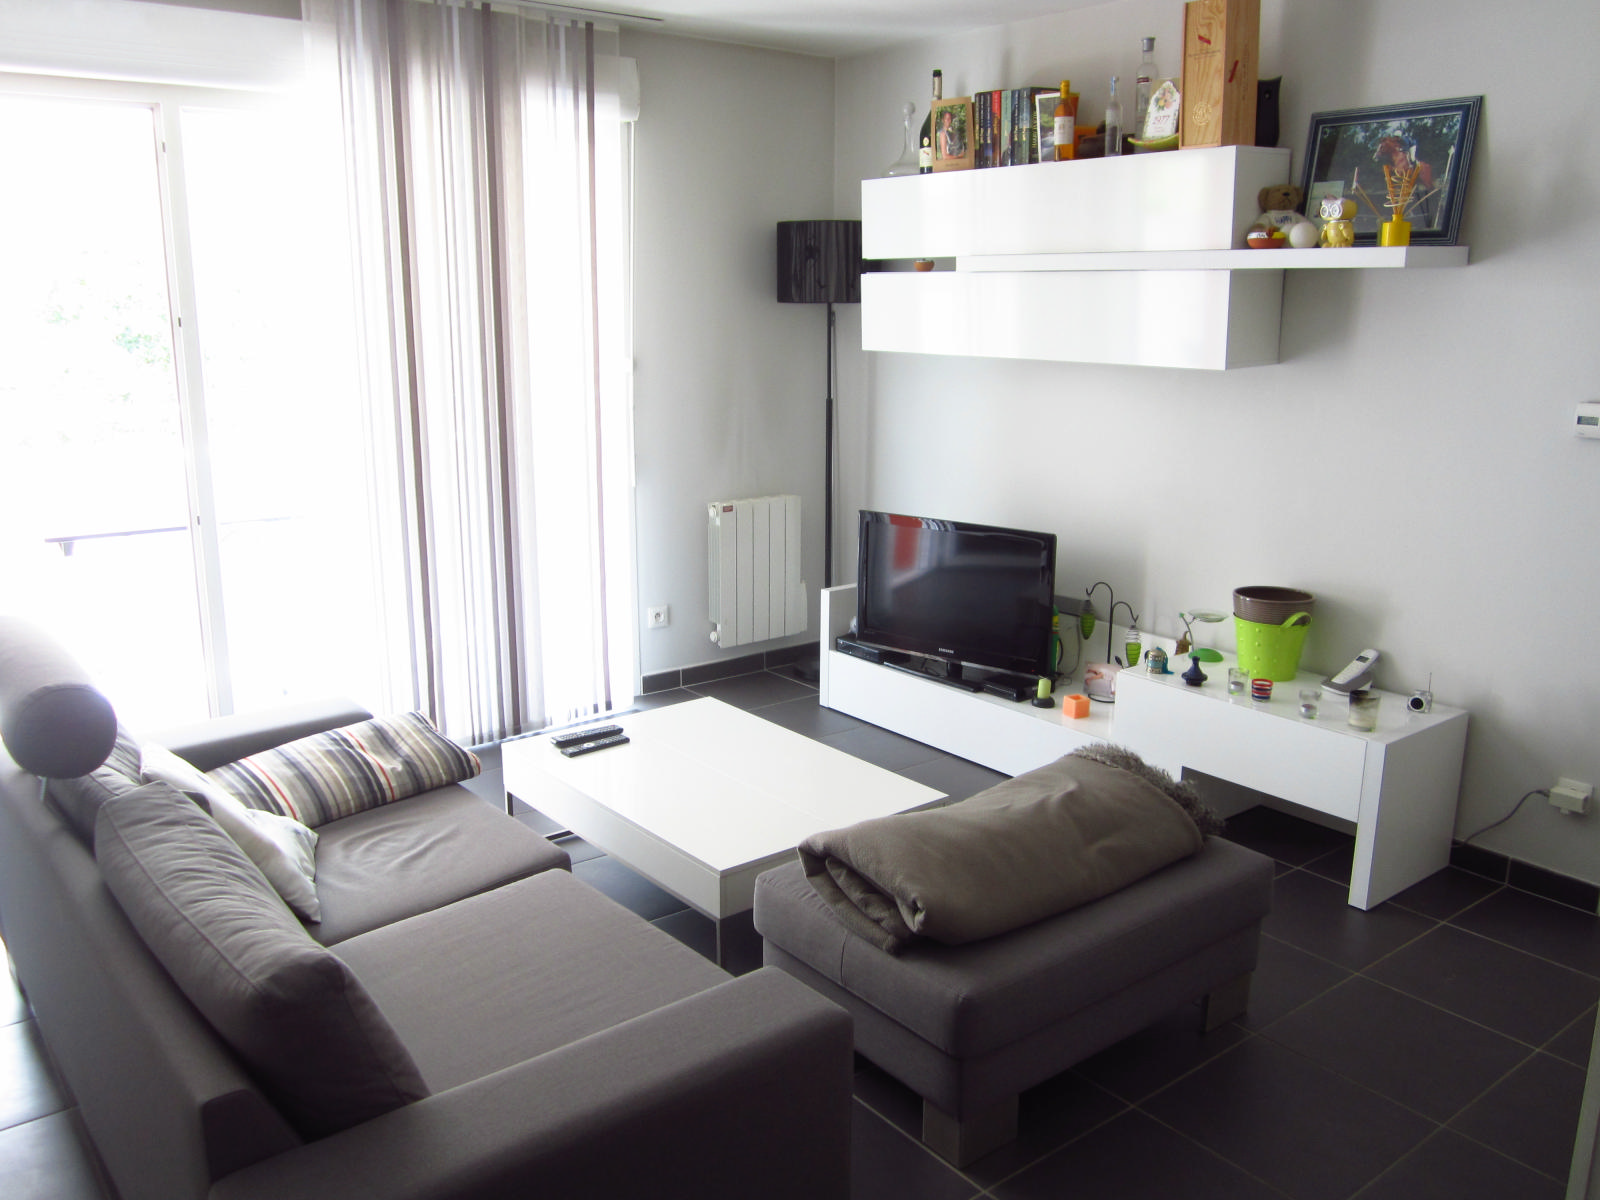 EXCLUSIVITE Bossey appartement T2 en dernier étage...